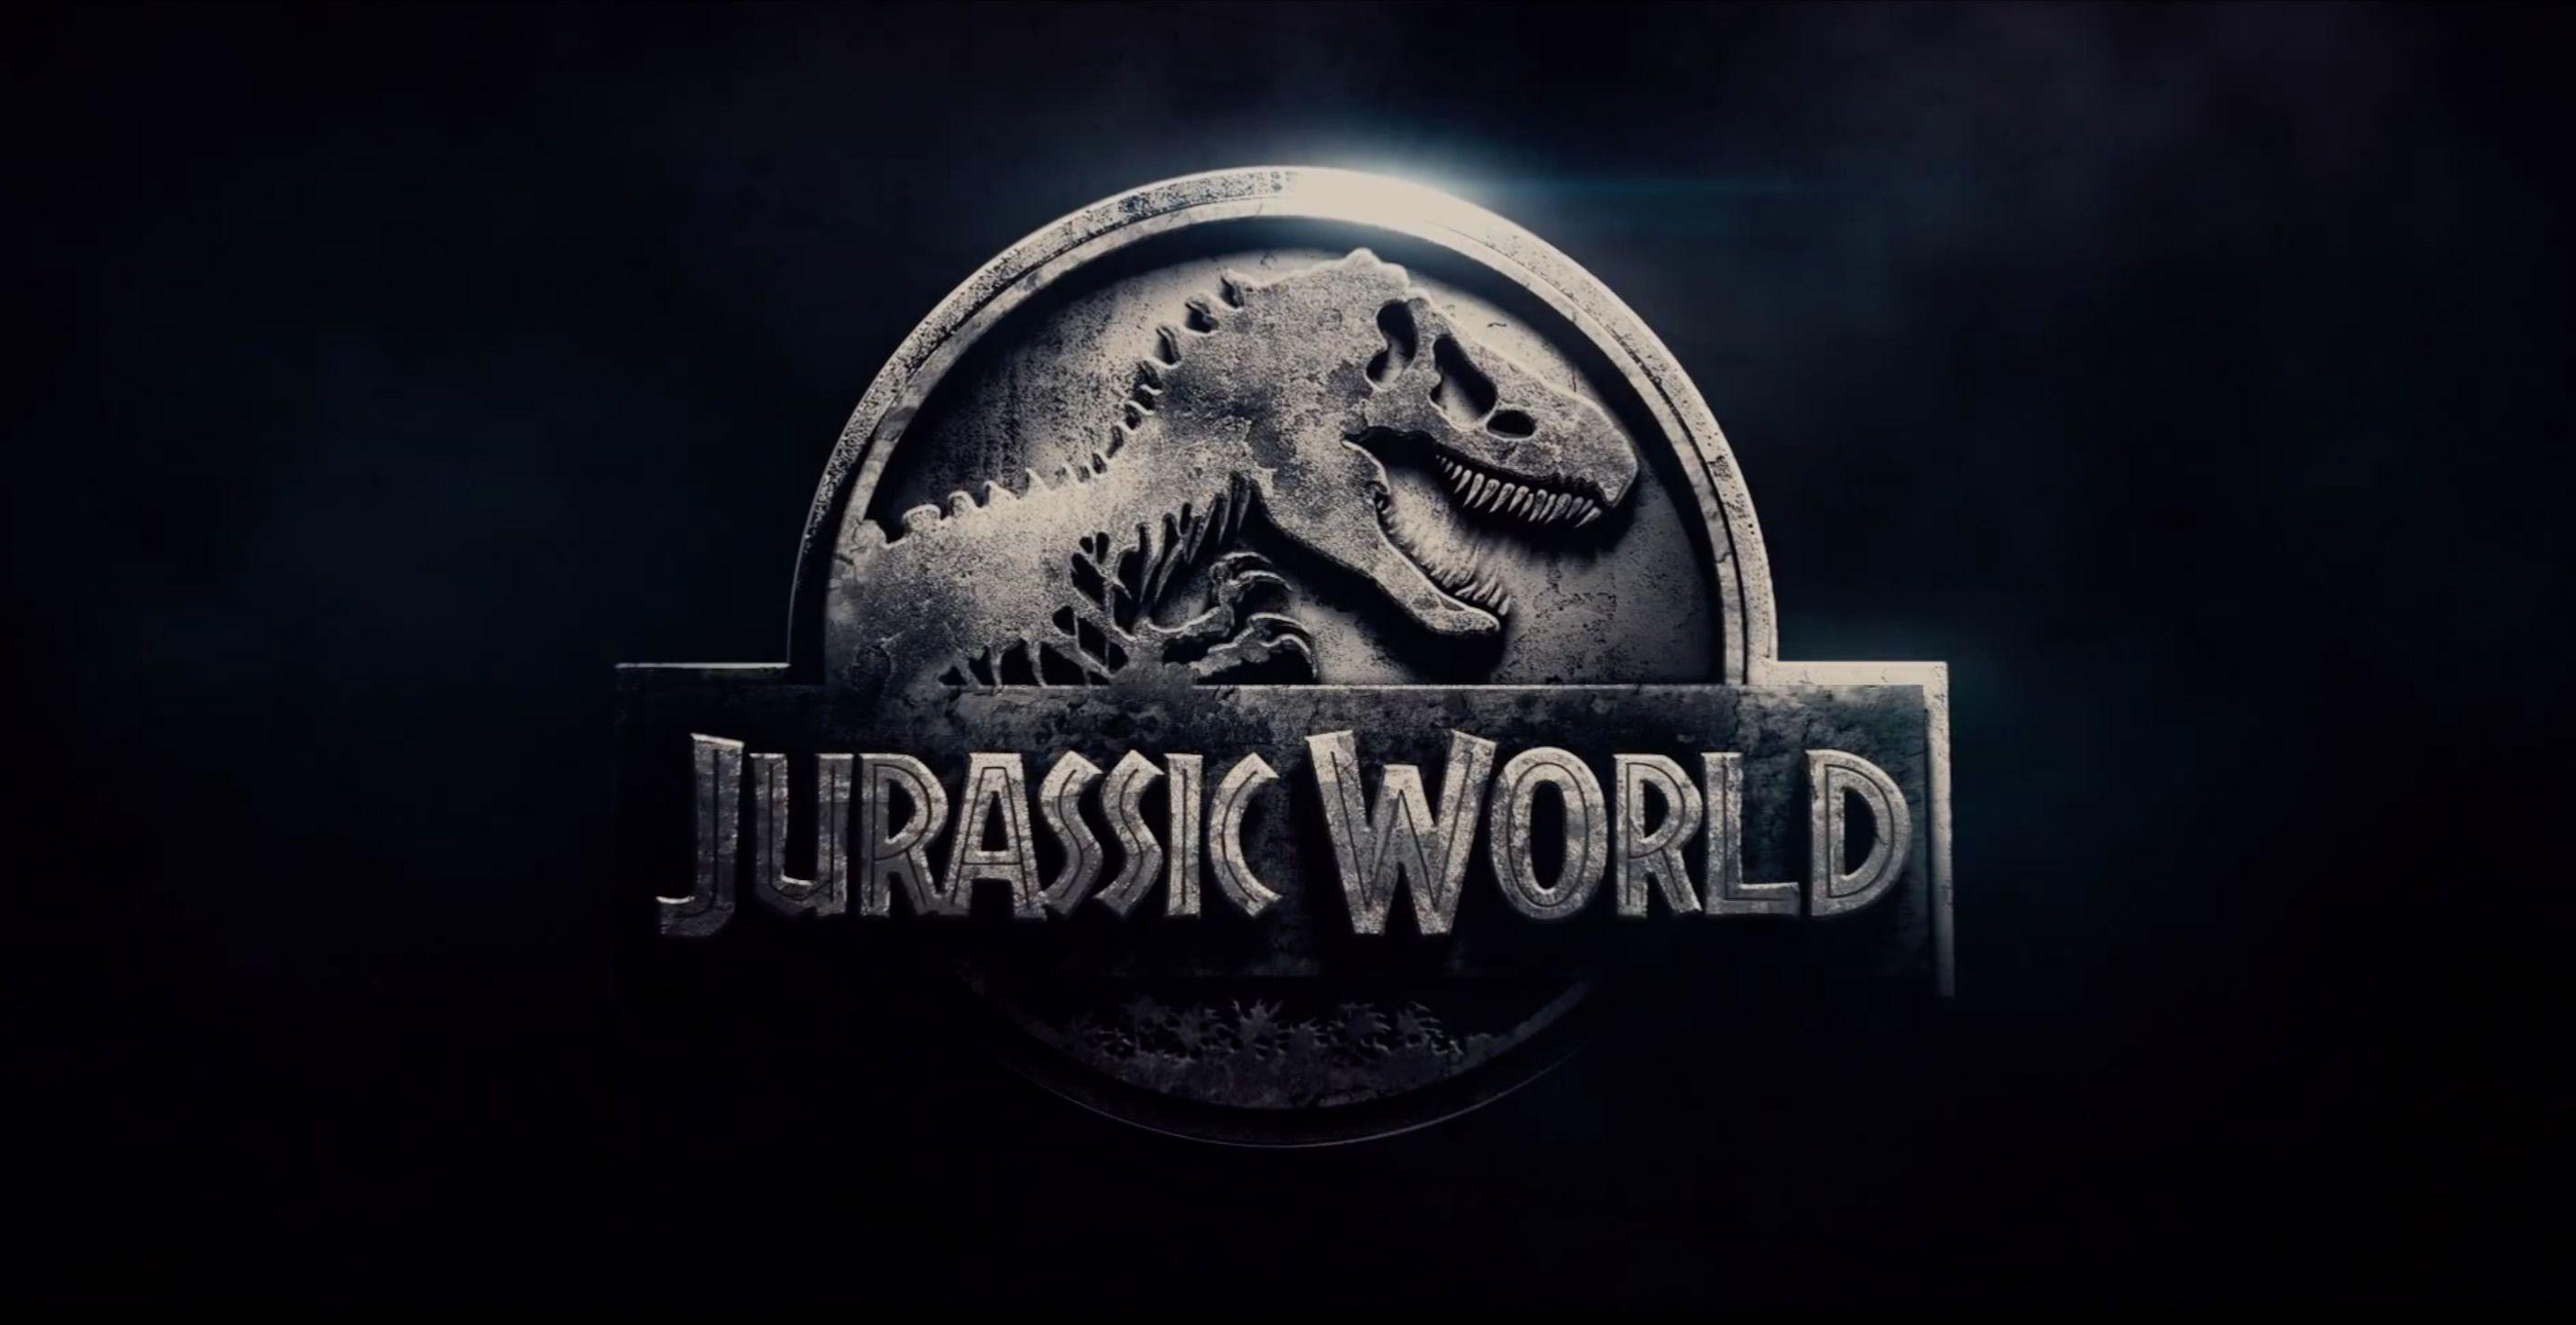 jurassic world adventure scifi dinosaur fantasy film park 1920a—1080 jurassic park 4 wallpapers 44 wallpapers adorable wallpapers desktop pinterest